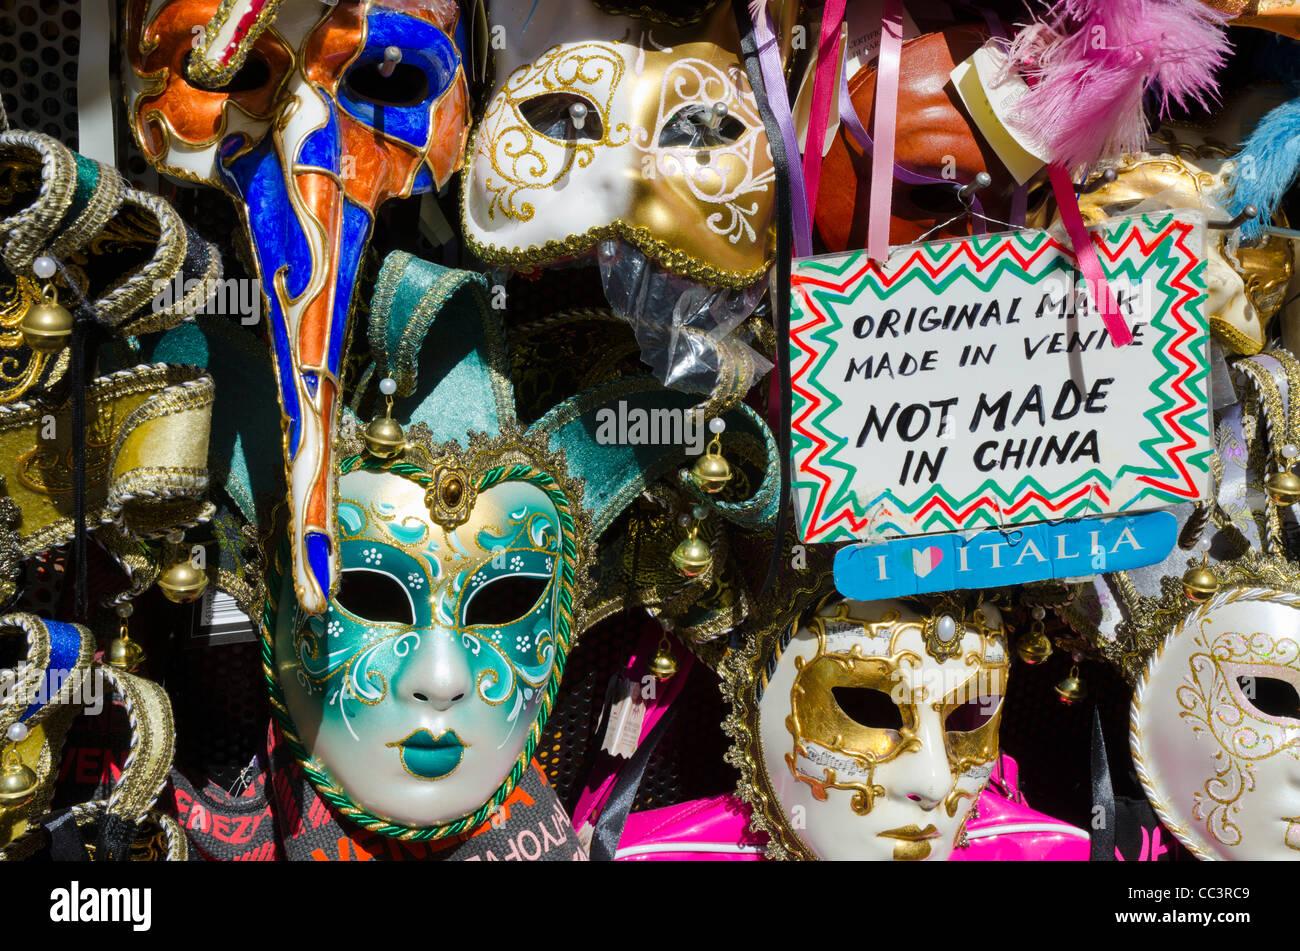 Italy, Veneto, Venice, Venetian masks for sale - Stock Image